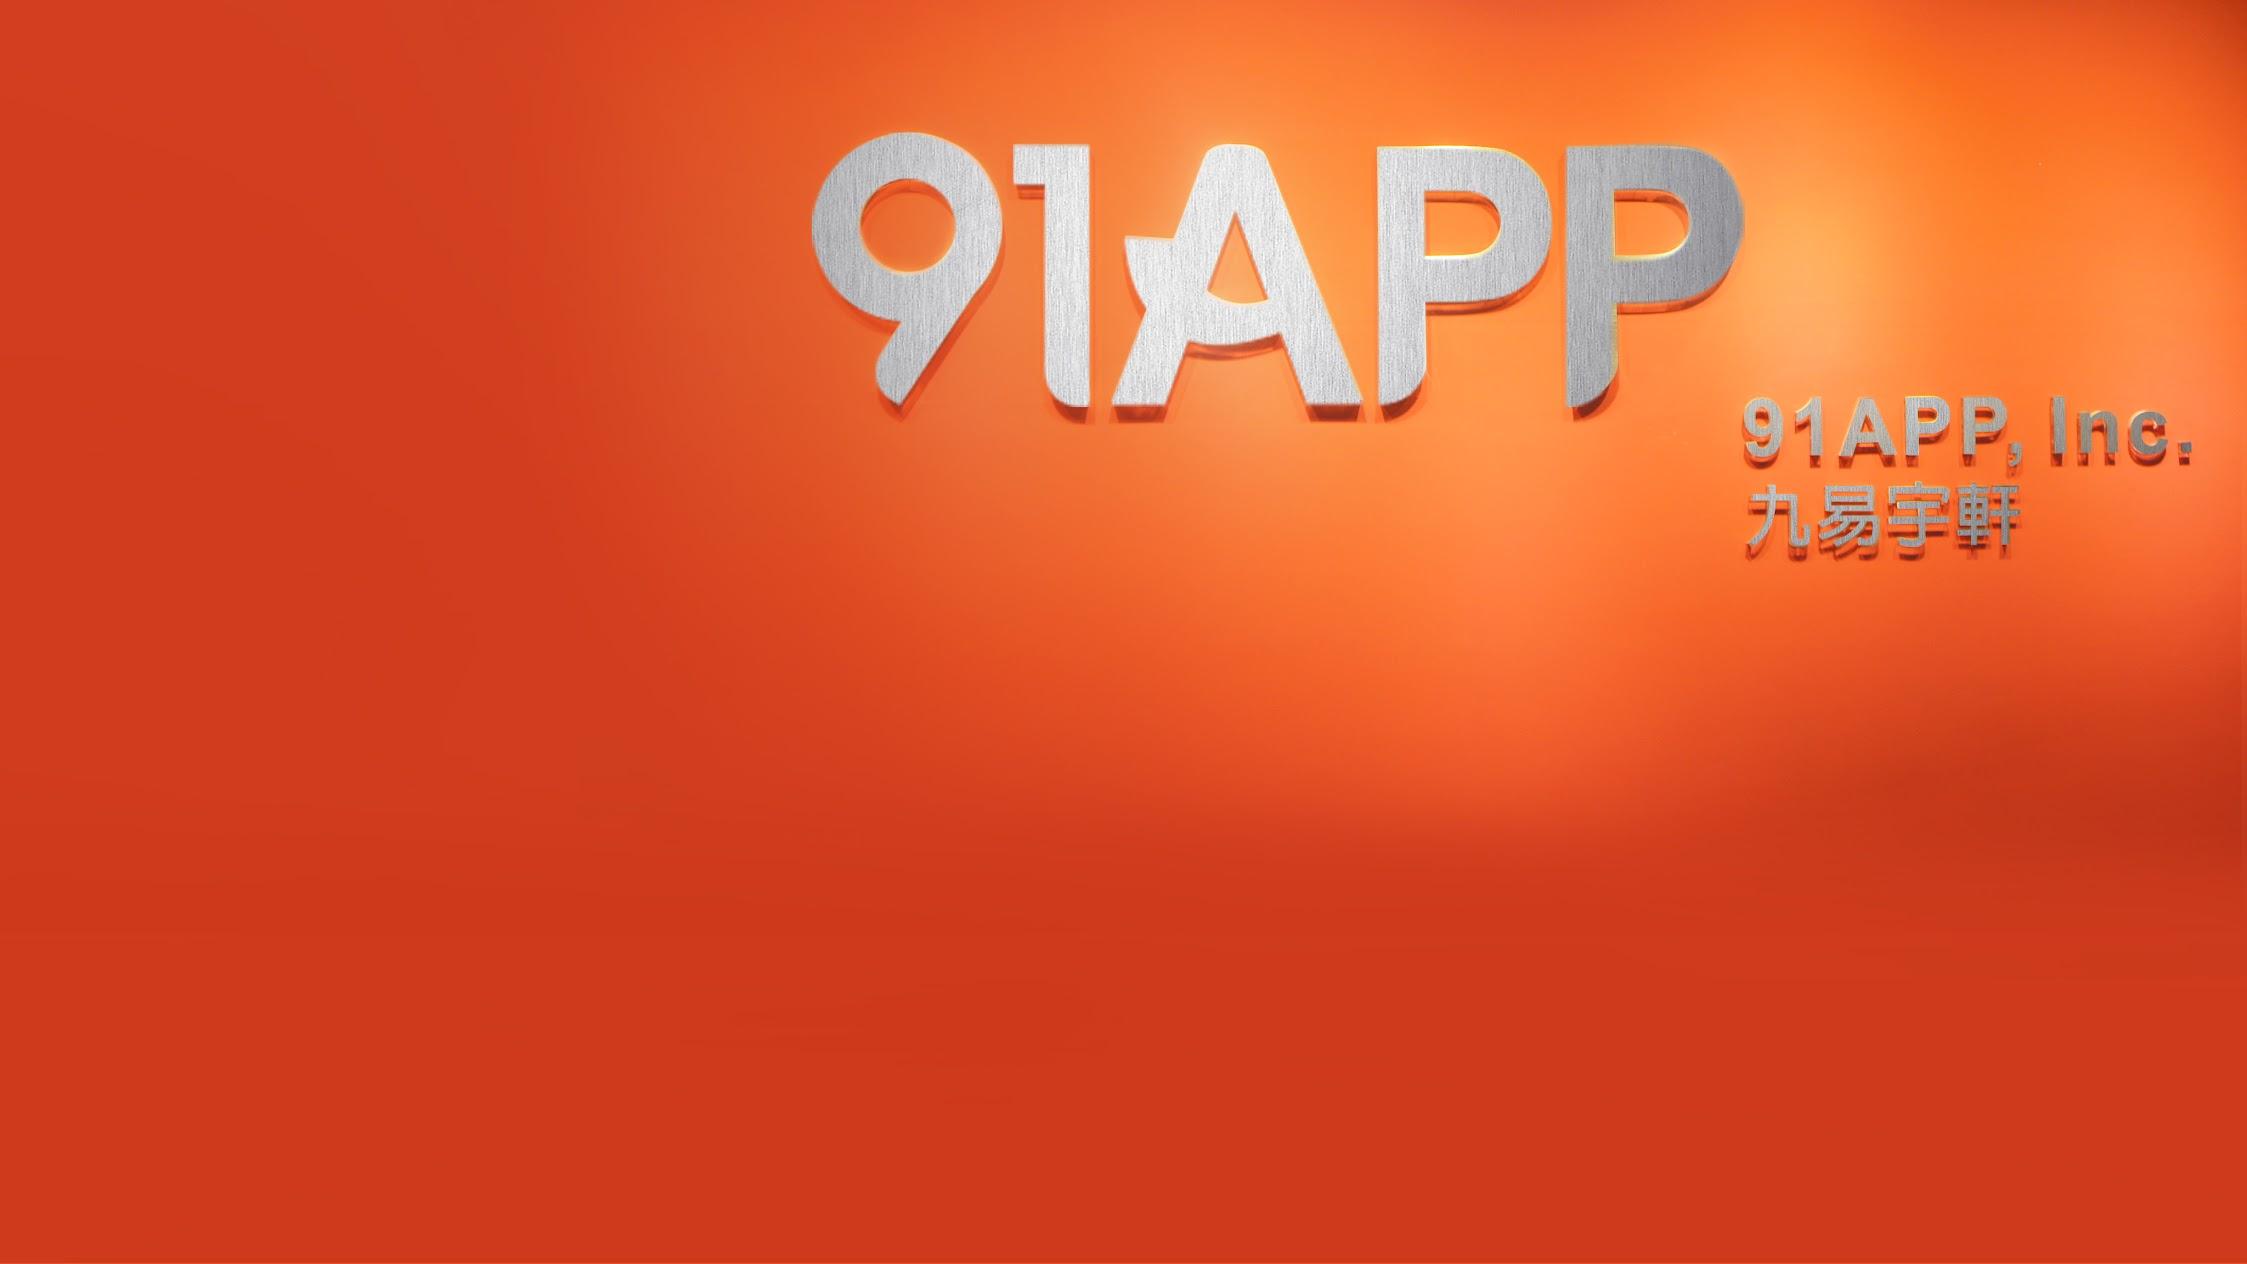 91APP, Inc. (8)